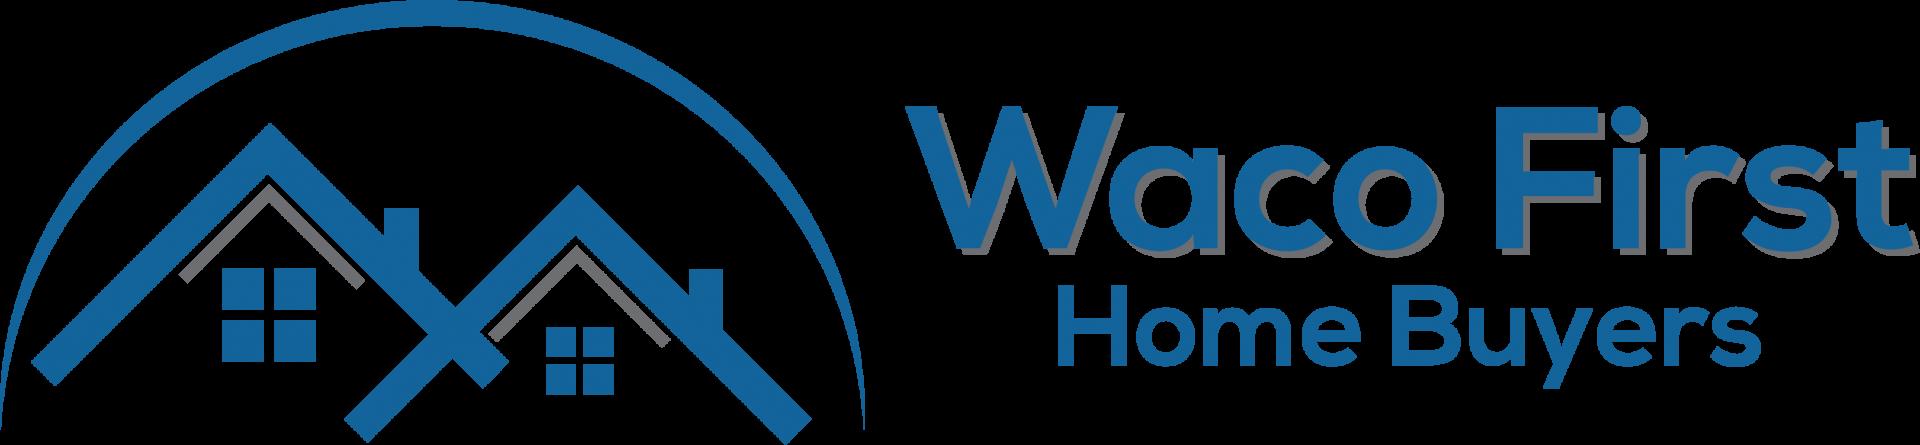 Waco First Home Buyers  logo